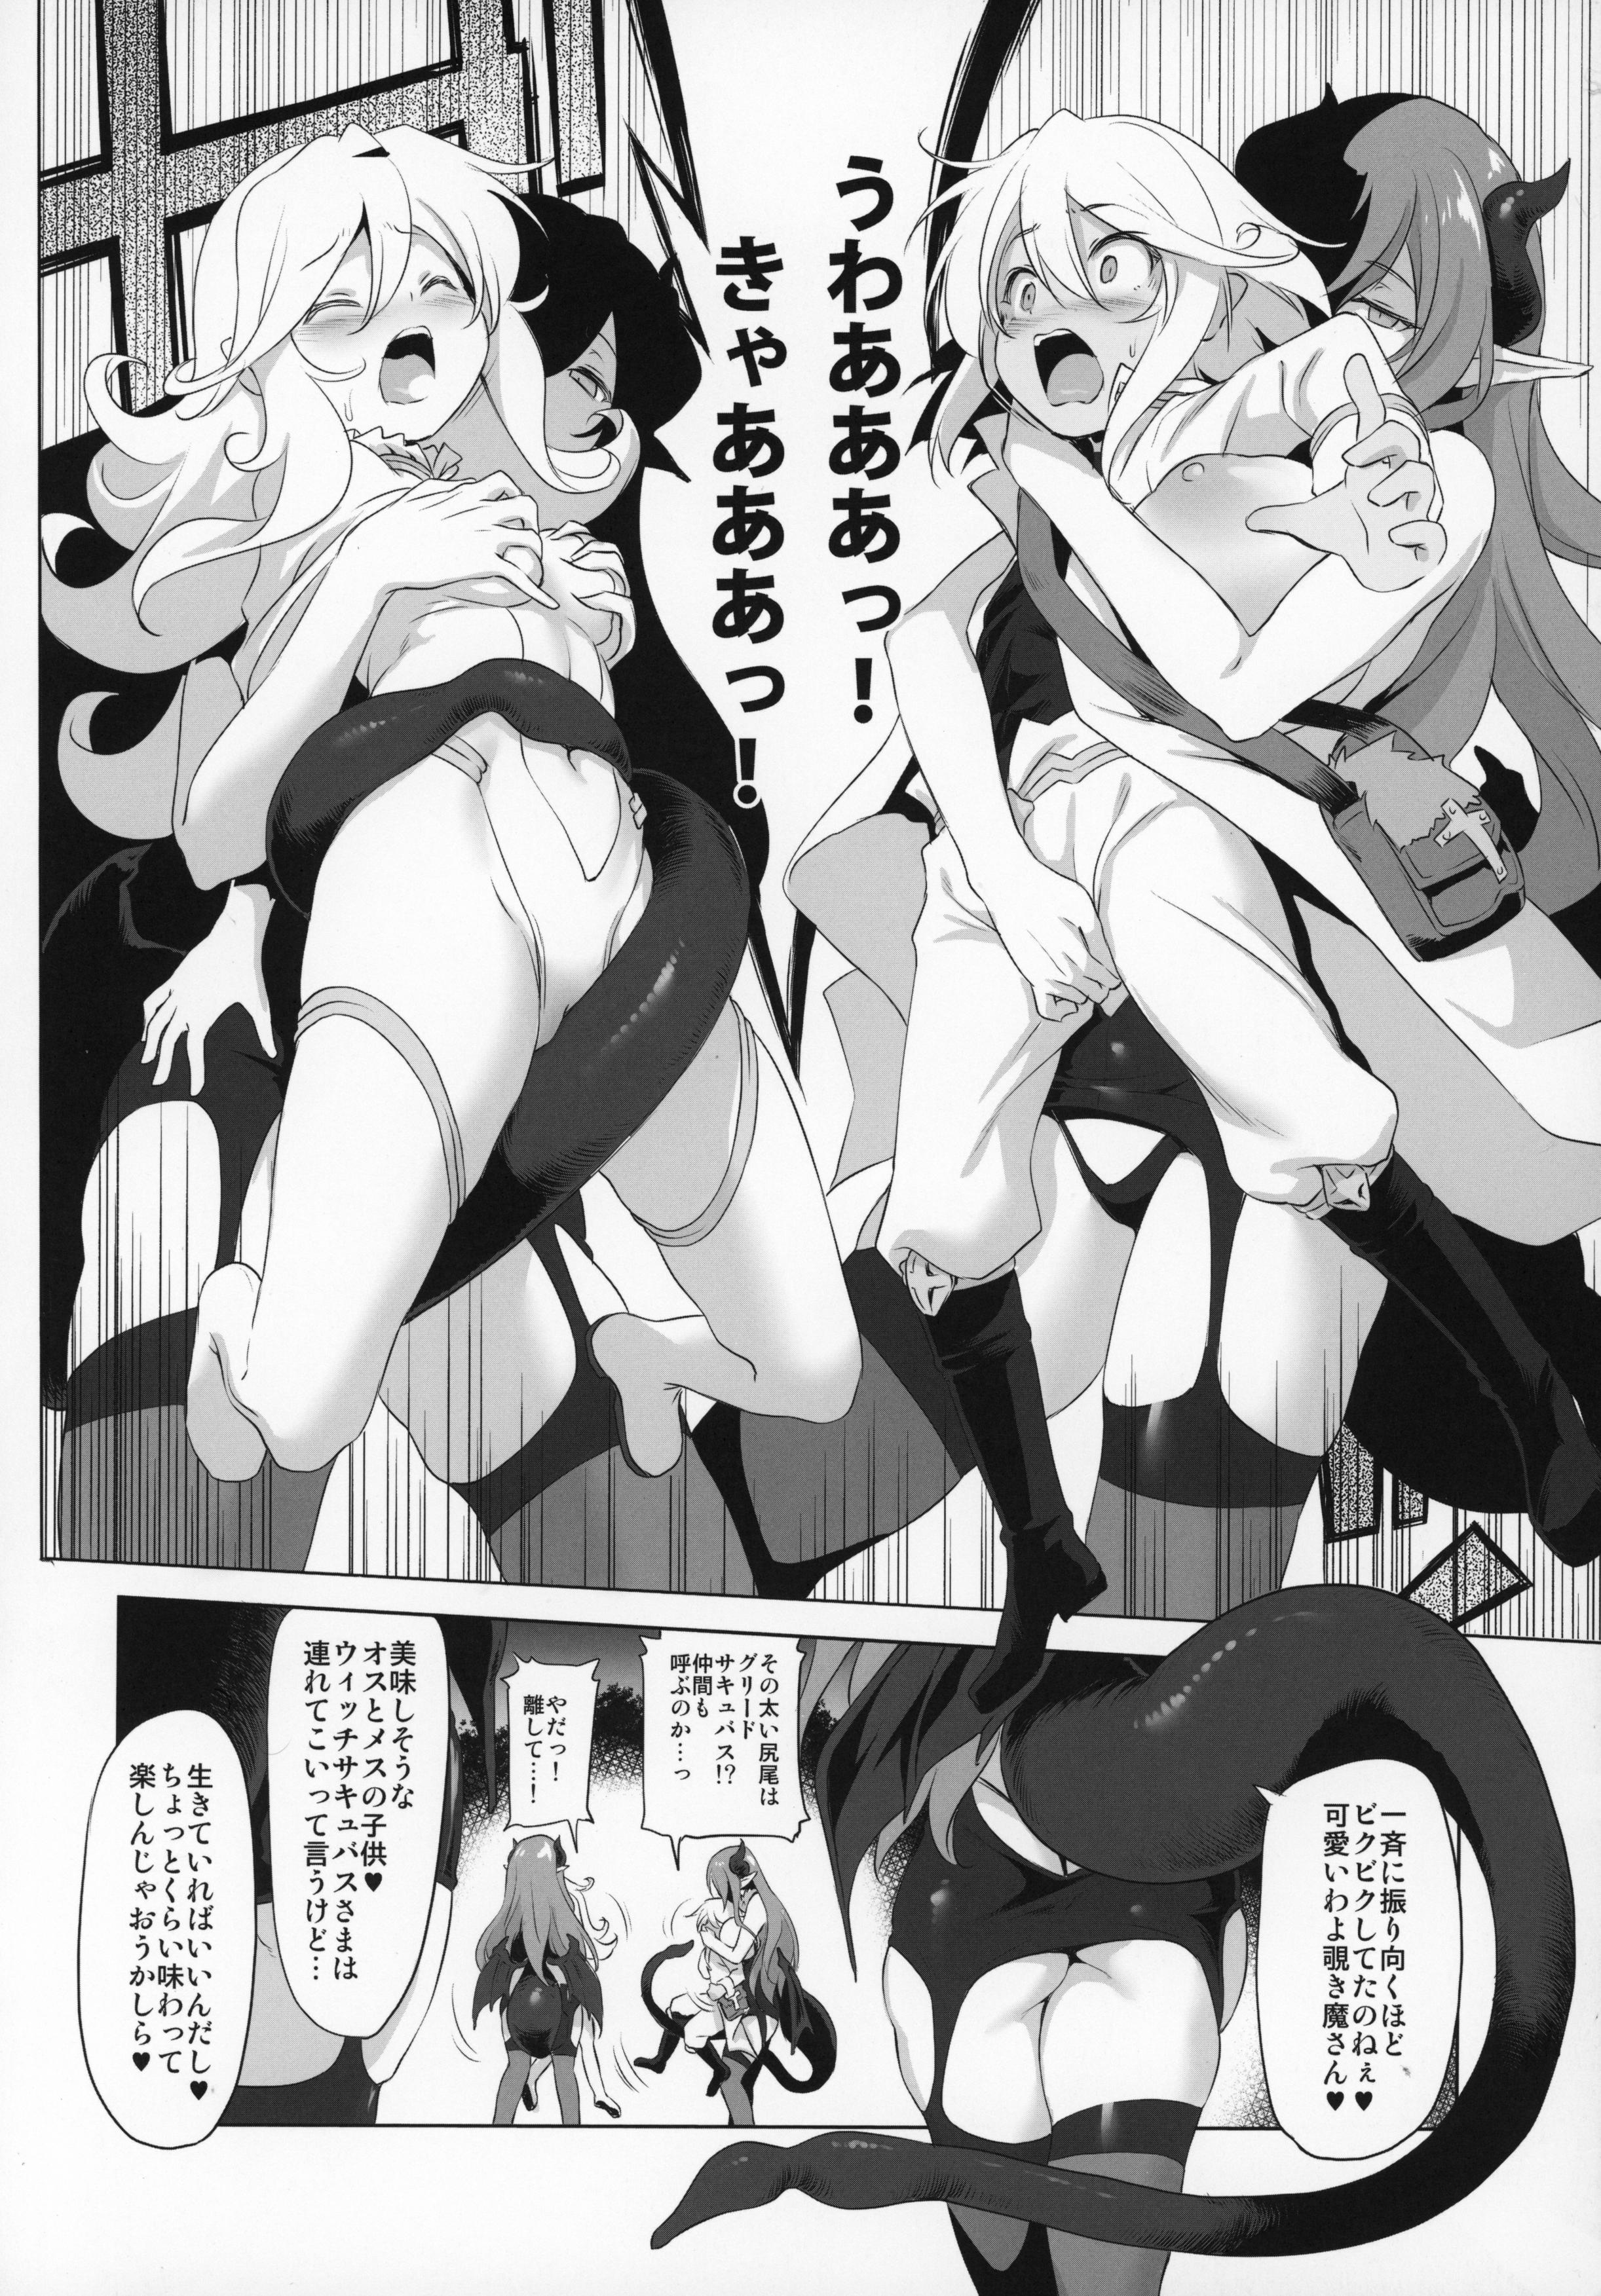 C 97 KAMINENDO CORP Akazawa RED 6 005